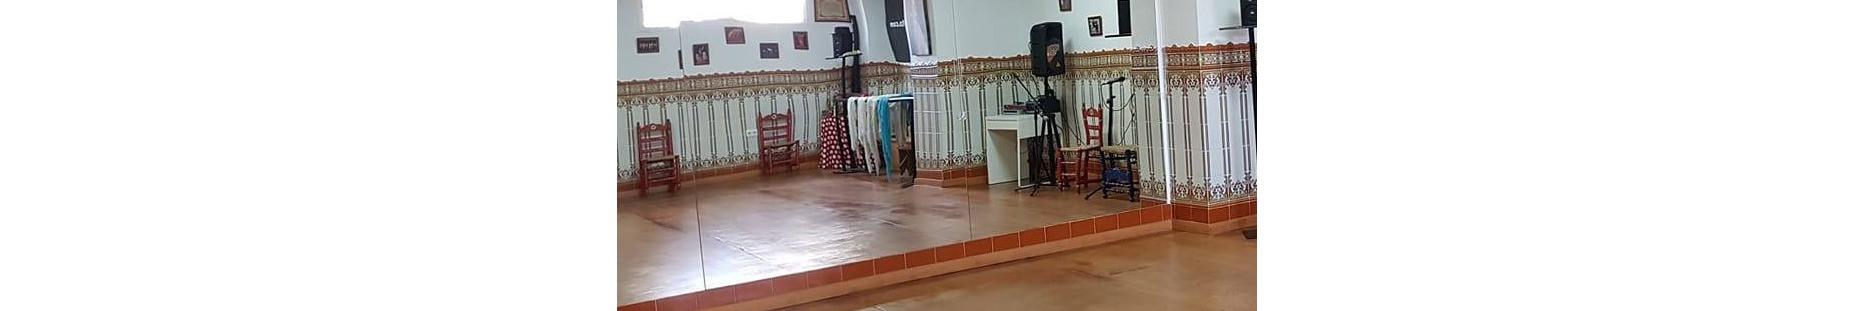 Estudio de Baile Flamenco Pilar Soto